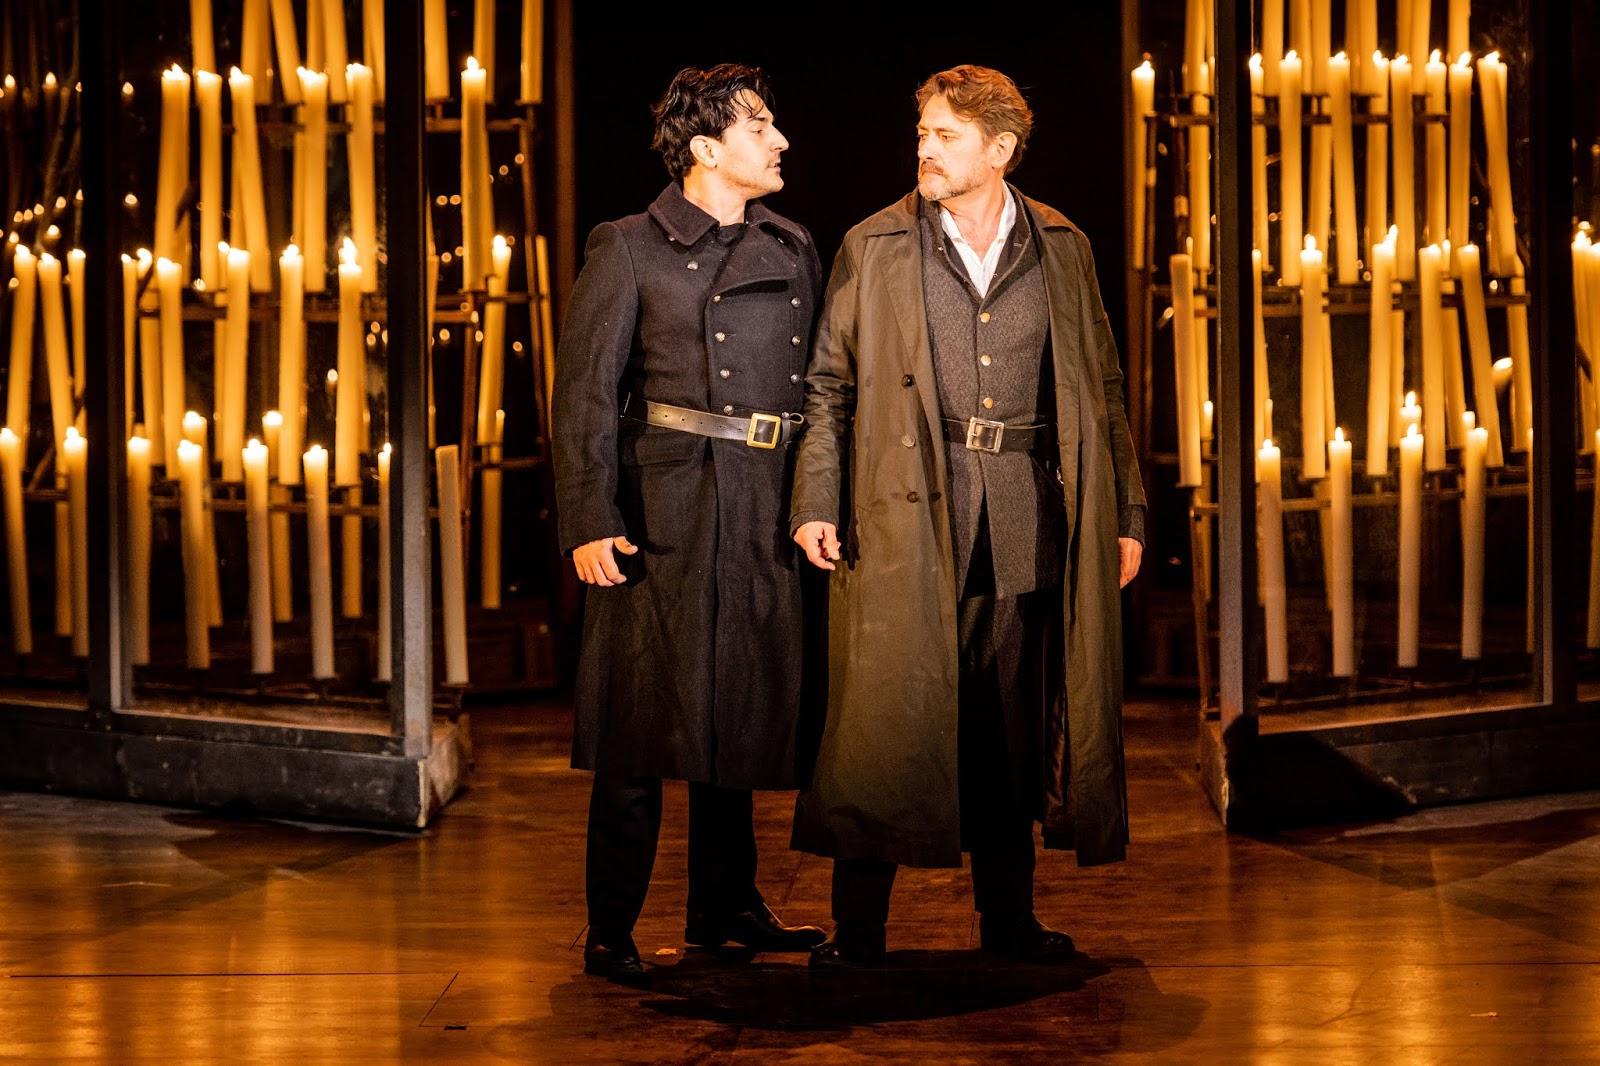 Verdi: Don Carlo Act 1 - Leonardo Capalbo, Brett Polegato - Grange Park Opera 2019 (Photo Robert Workman)